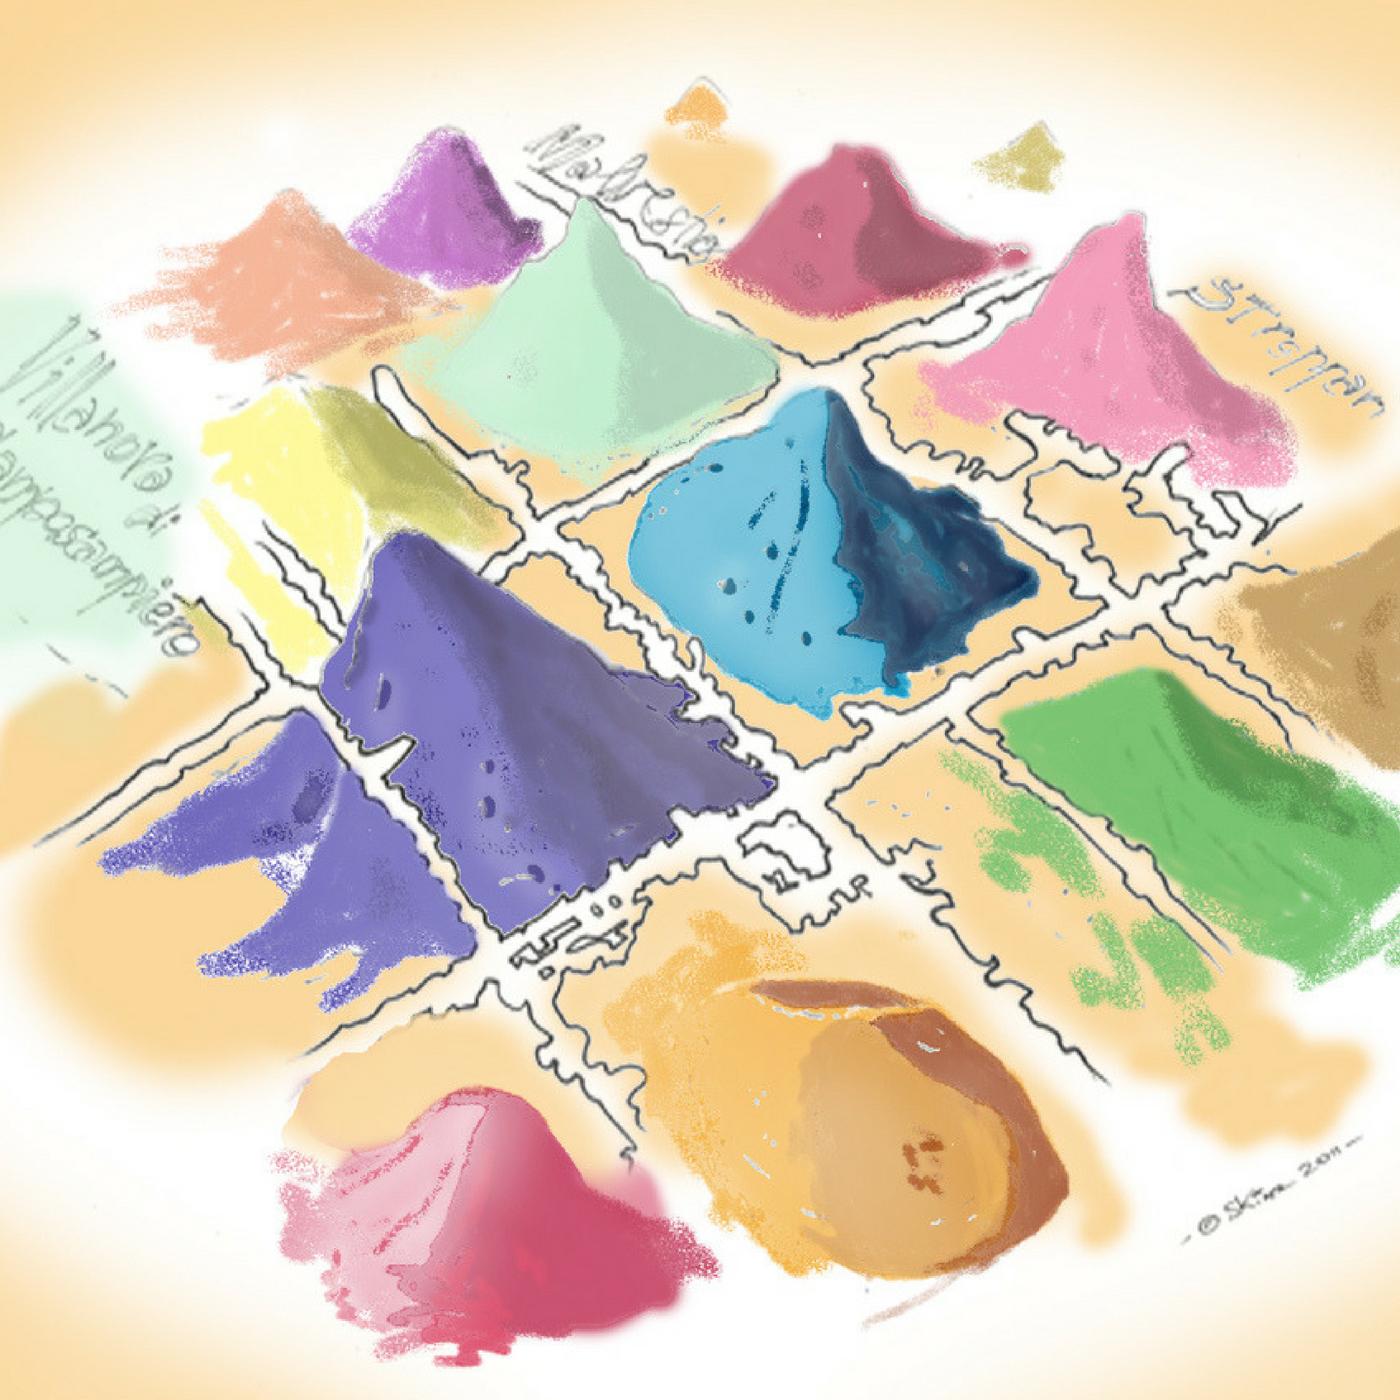 Pigmento Music The Grid Line